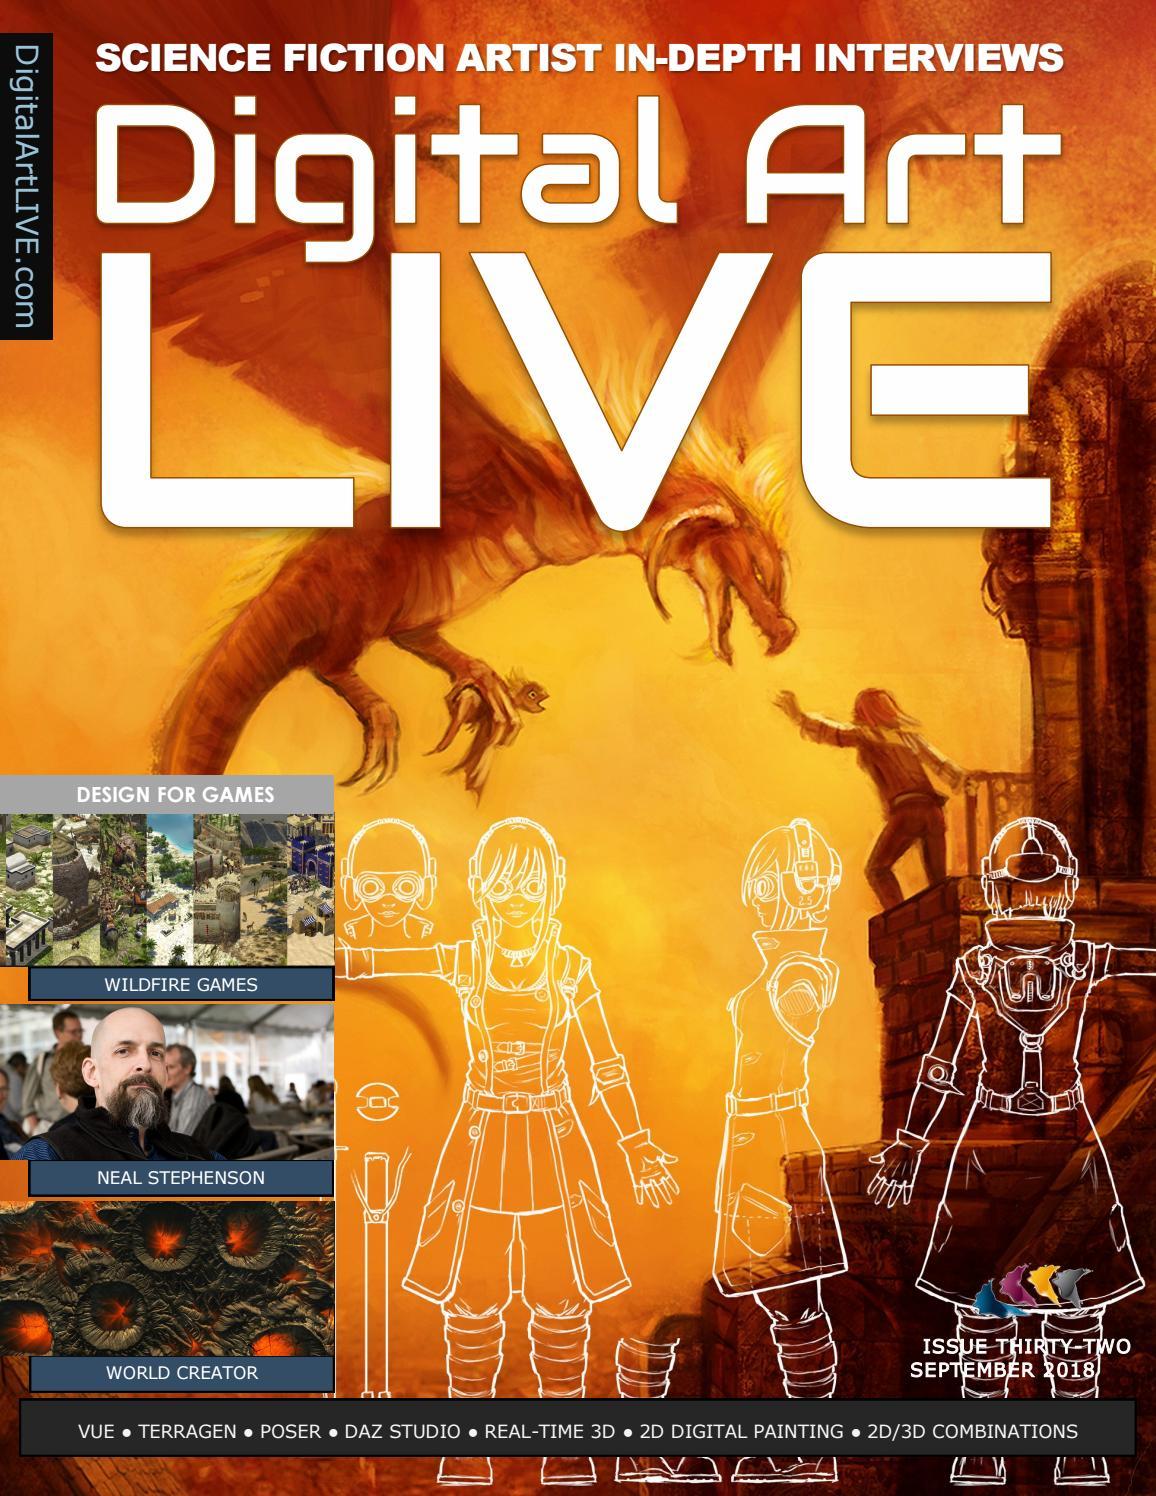 Digital Art Live Issue 32 by Digital Art Live - issuu